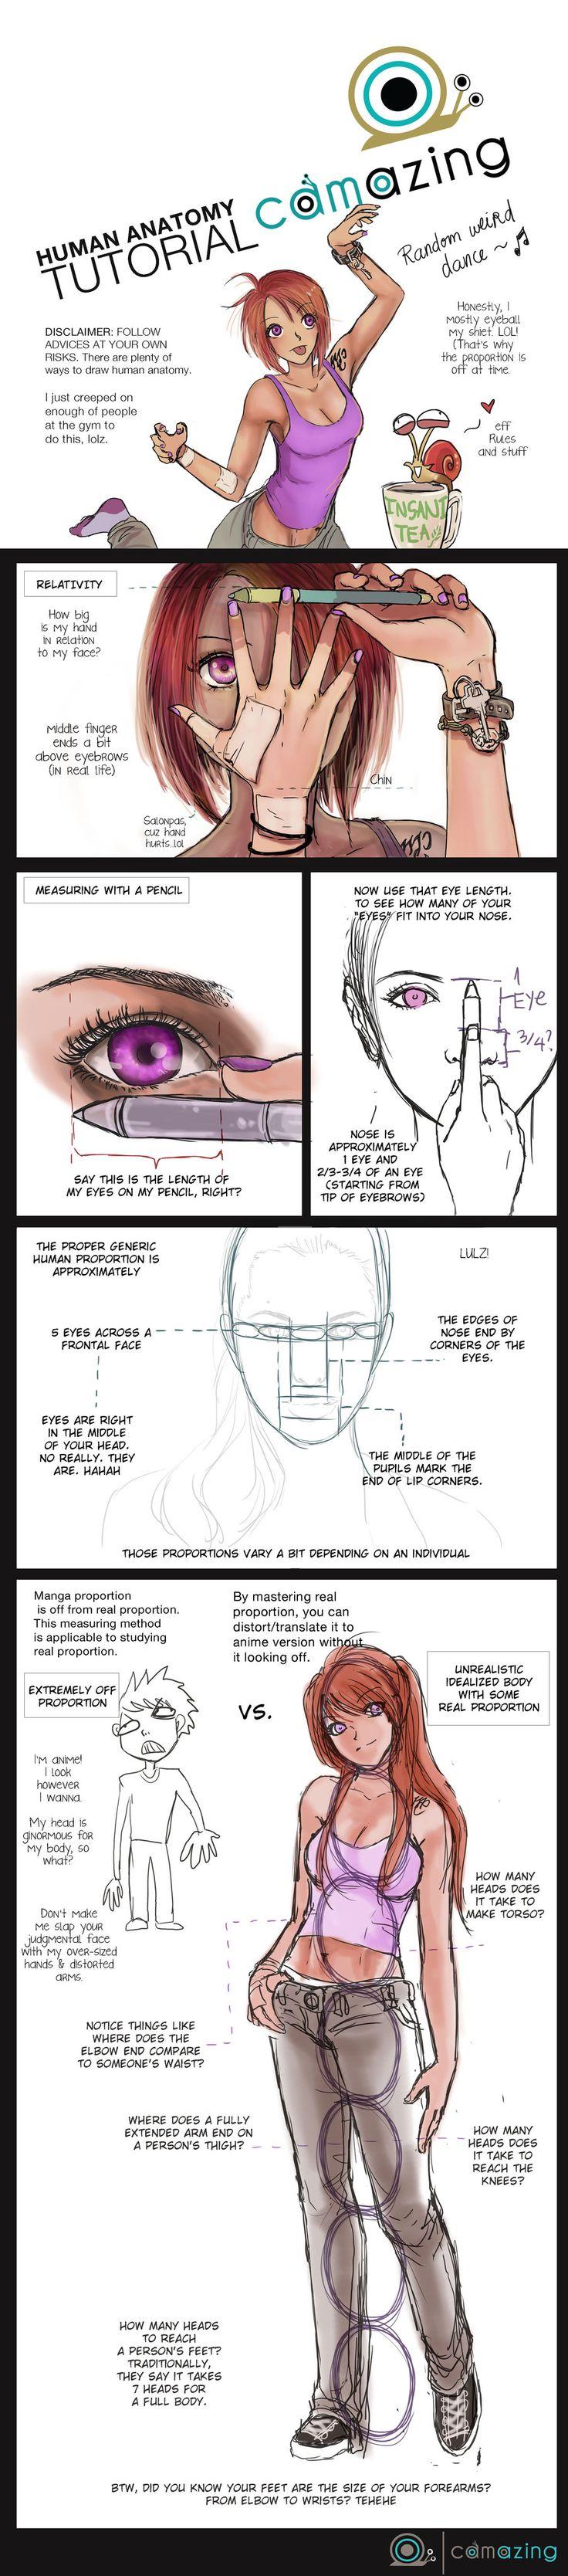 Anatomy Proportion Tutorial by Camazing on deviantART